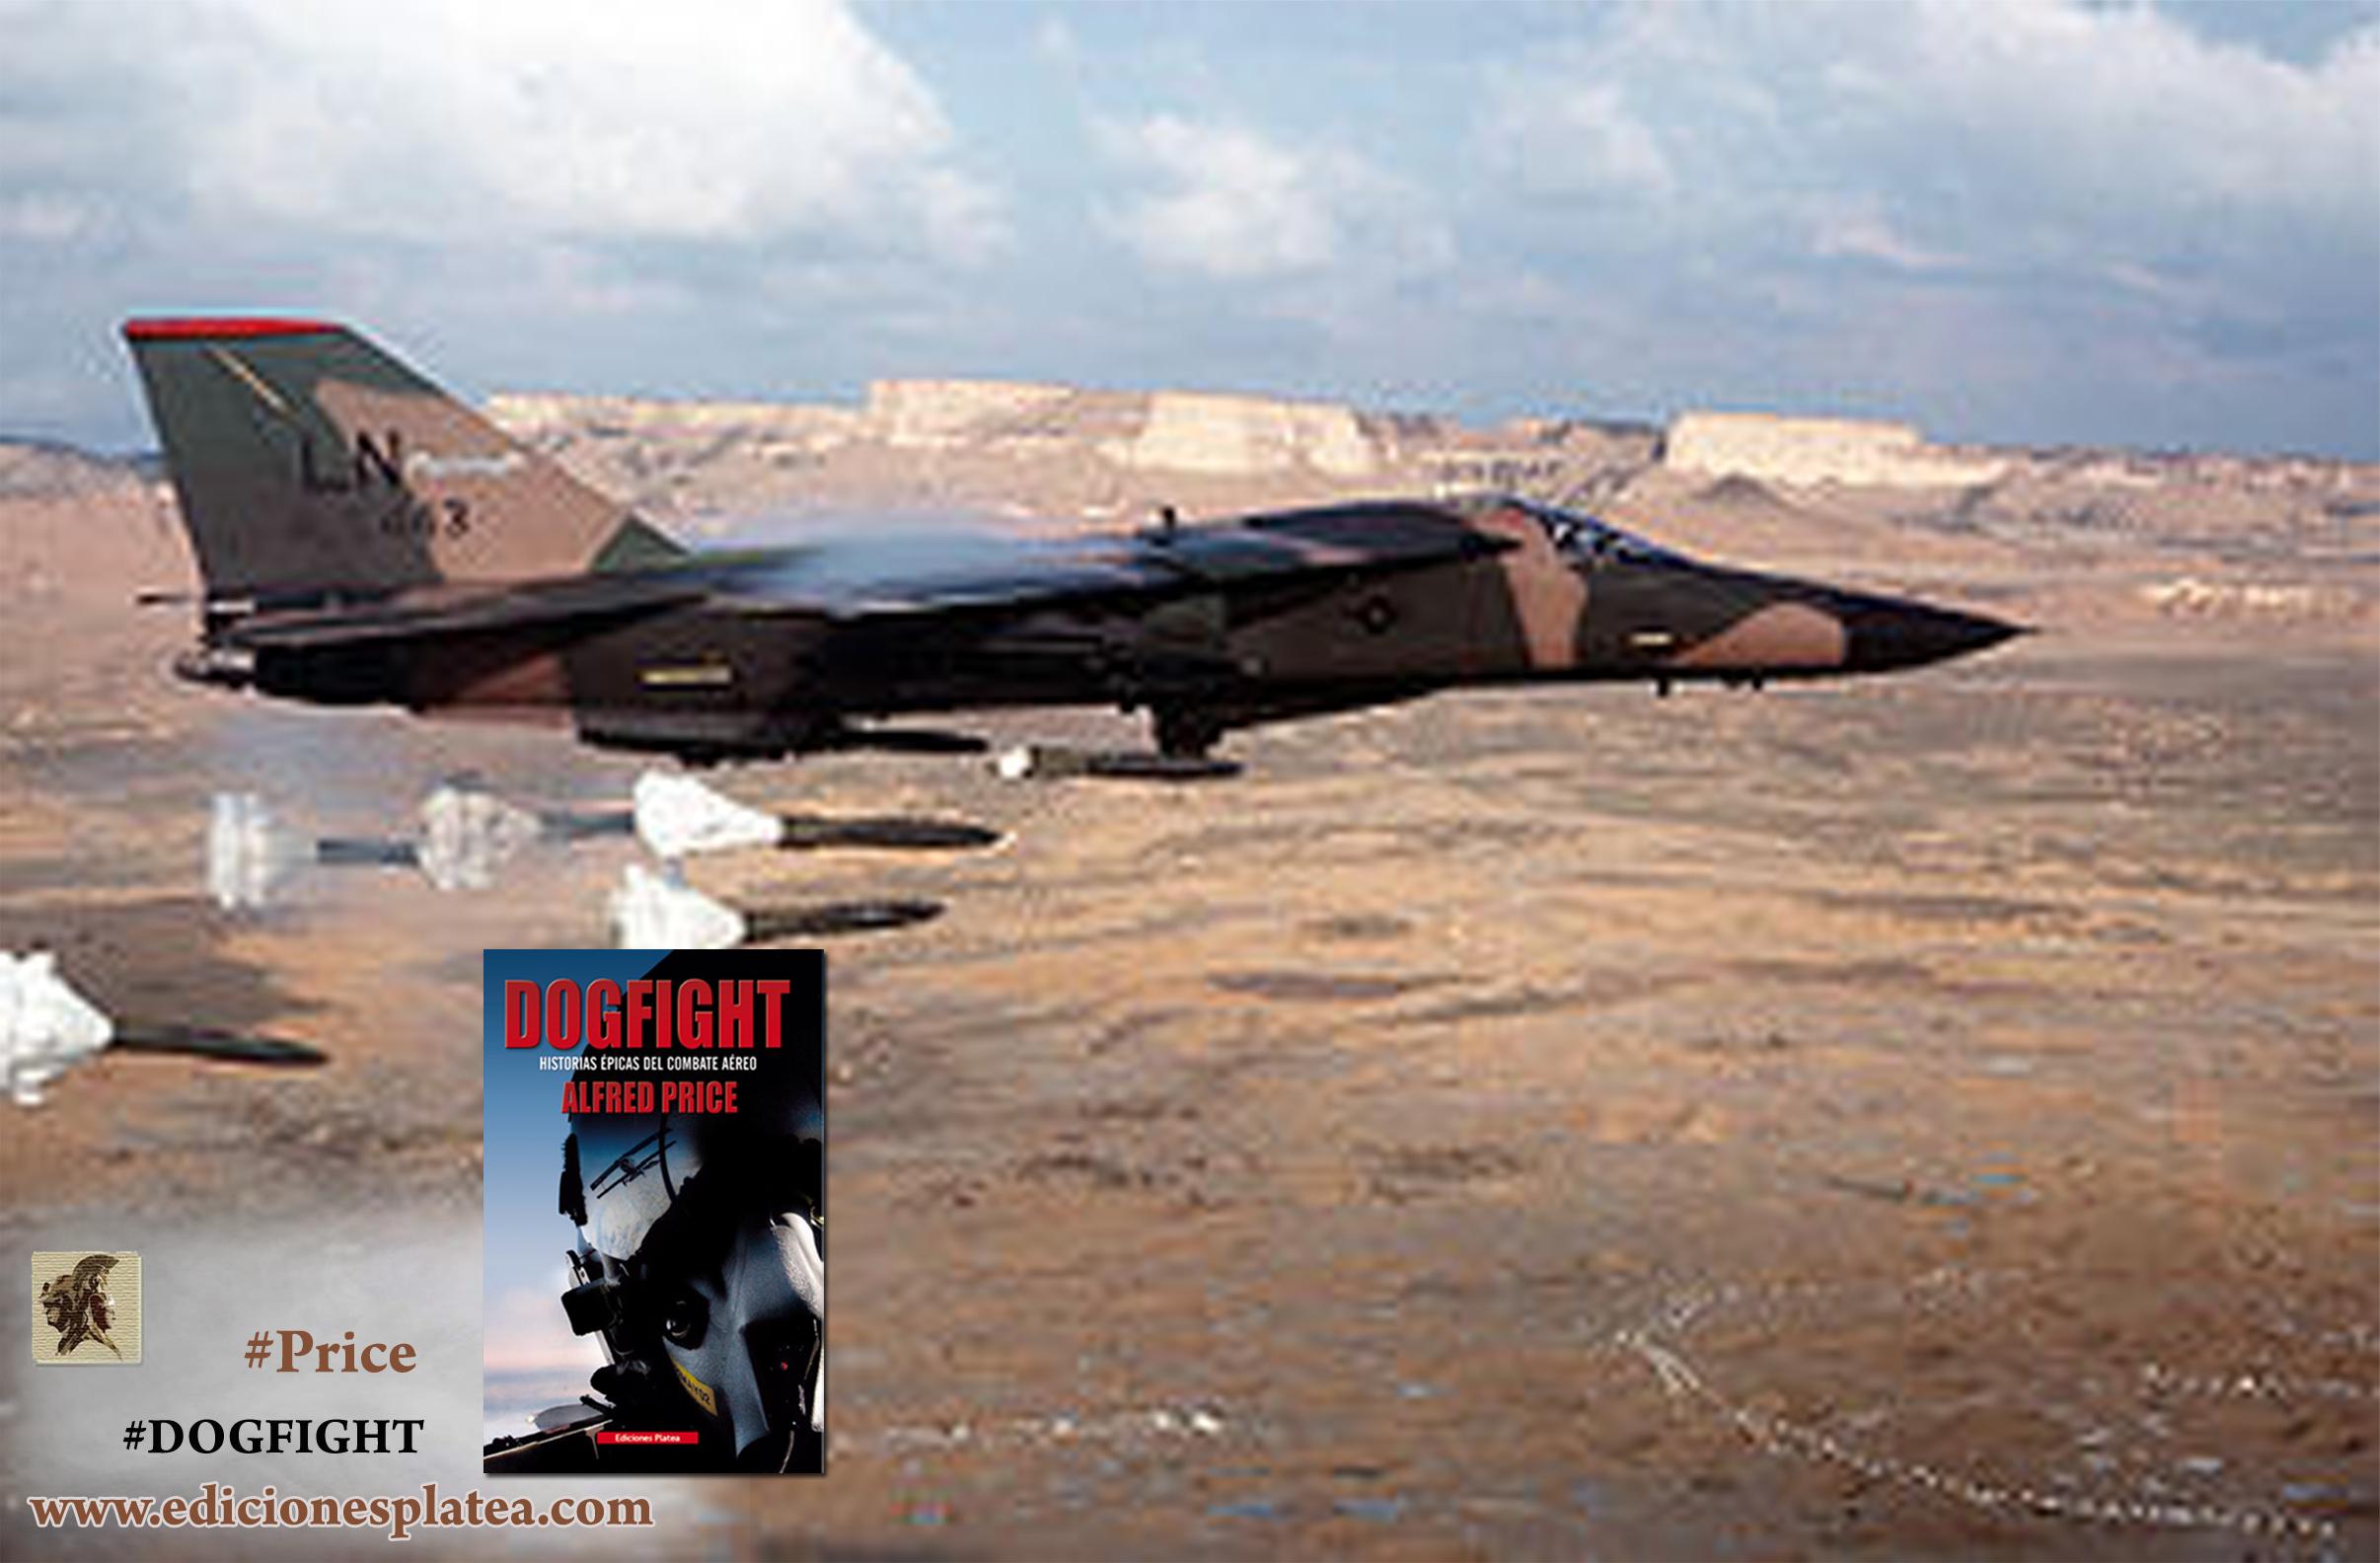 Dogfight p-2